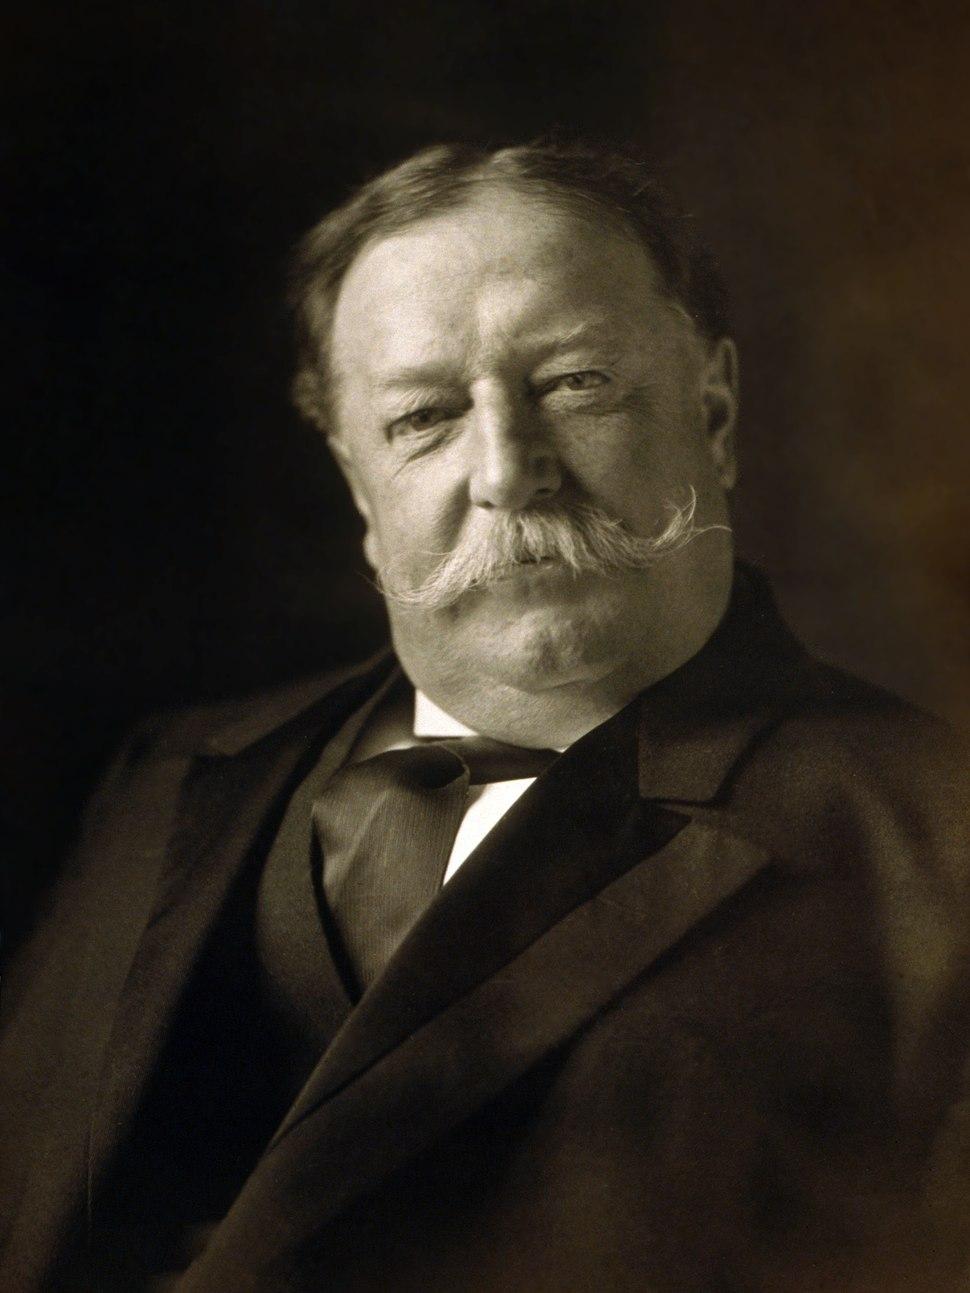 William Howard Taft, head-and-shoulders portrait, facing front